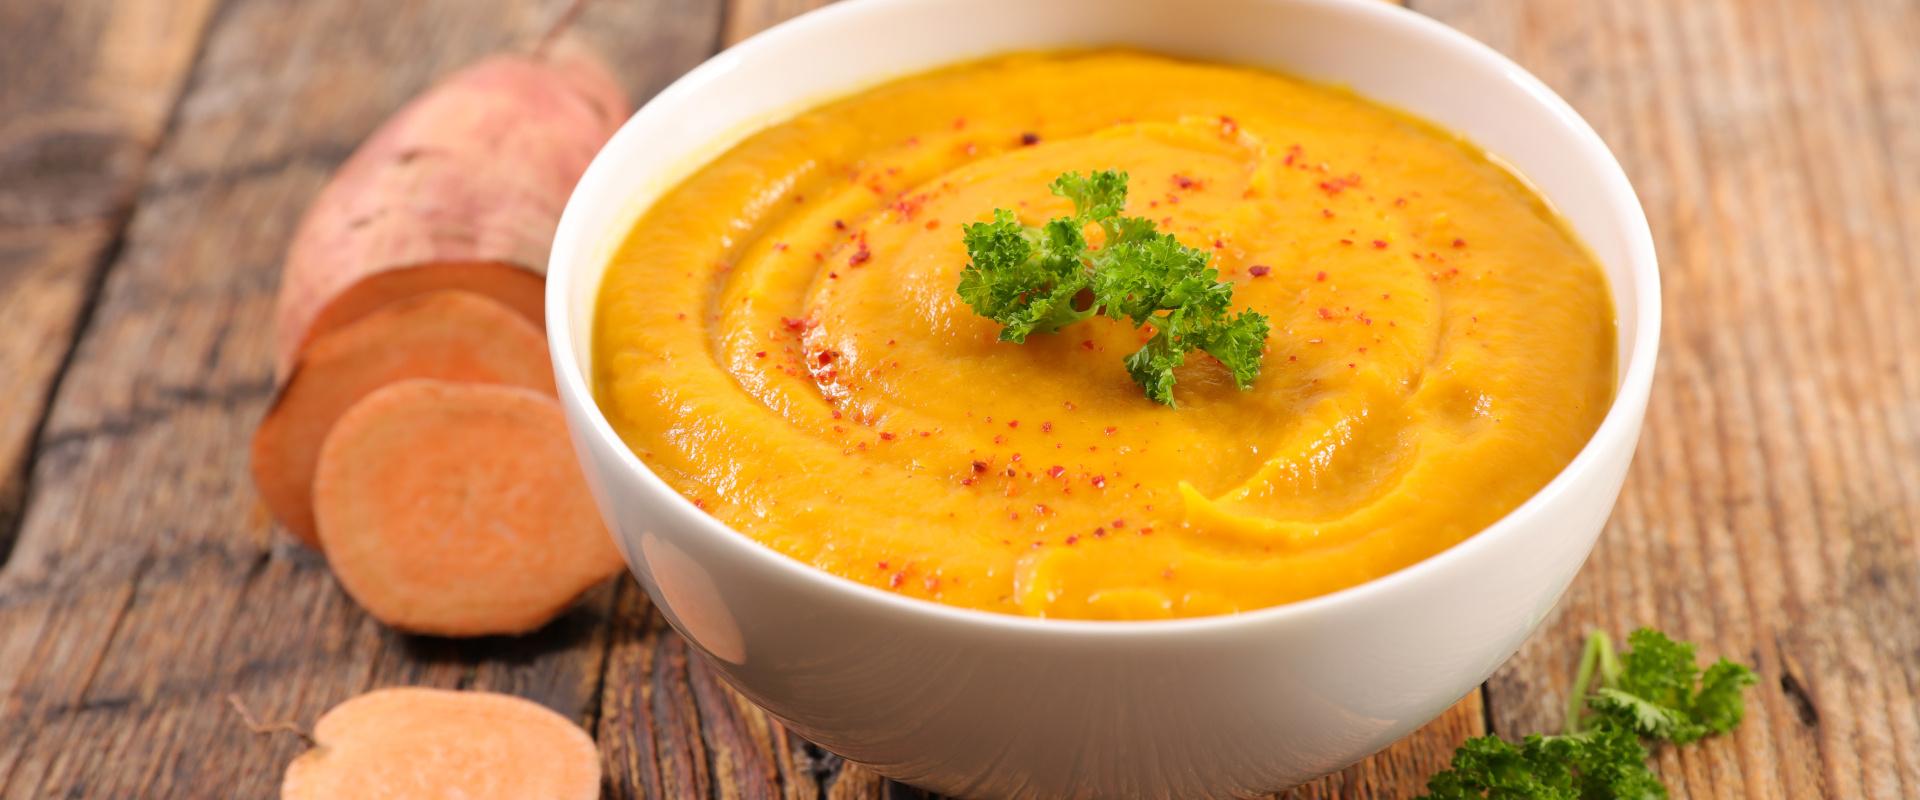 édeskrumpli leves cover